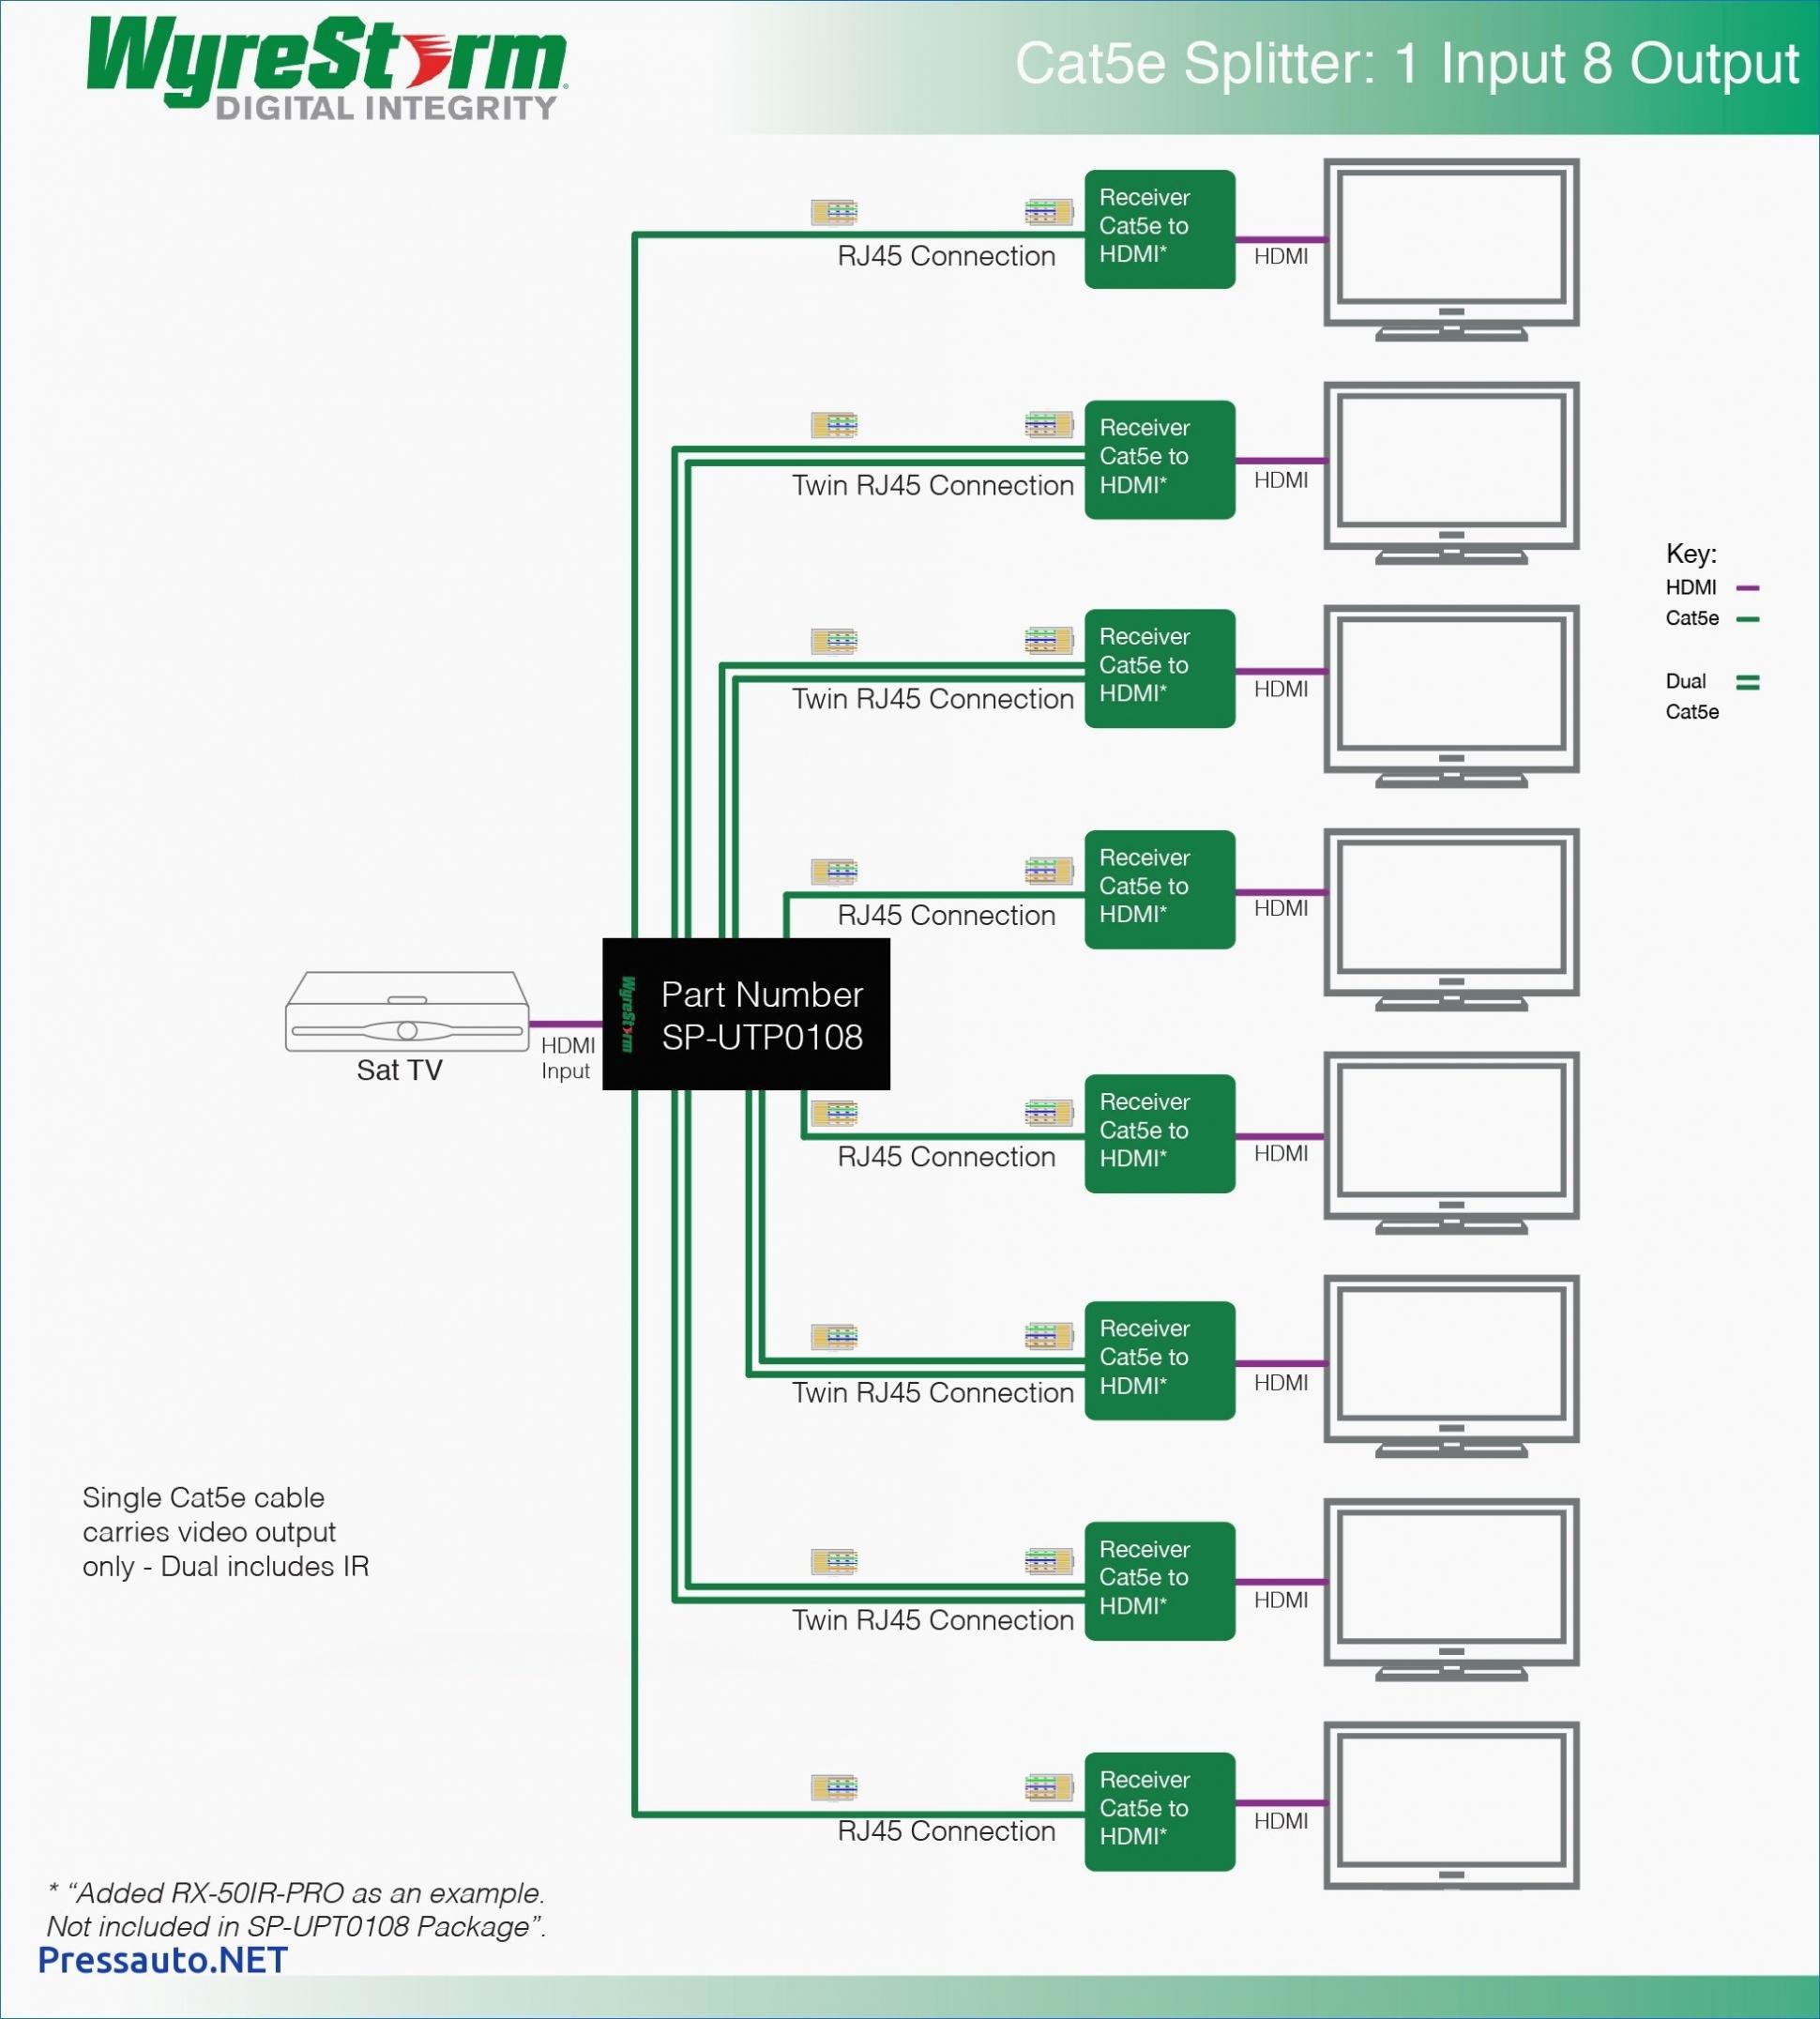 Rj11 Wiring Diagram – Awesome Telephone Rj11 Splitter Wiring Diagram - Rj11 Wiring Diagram